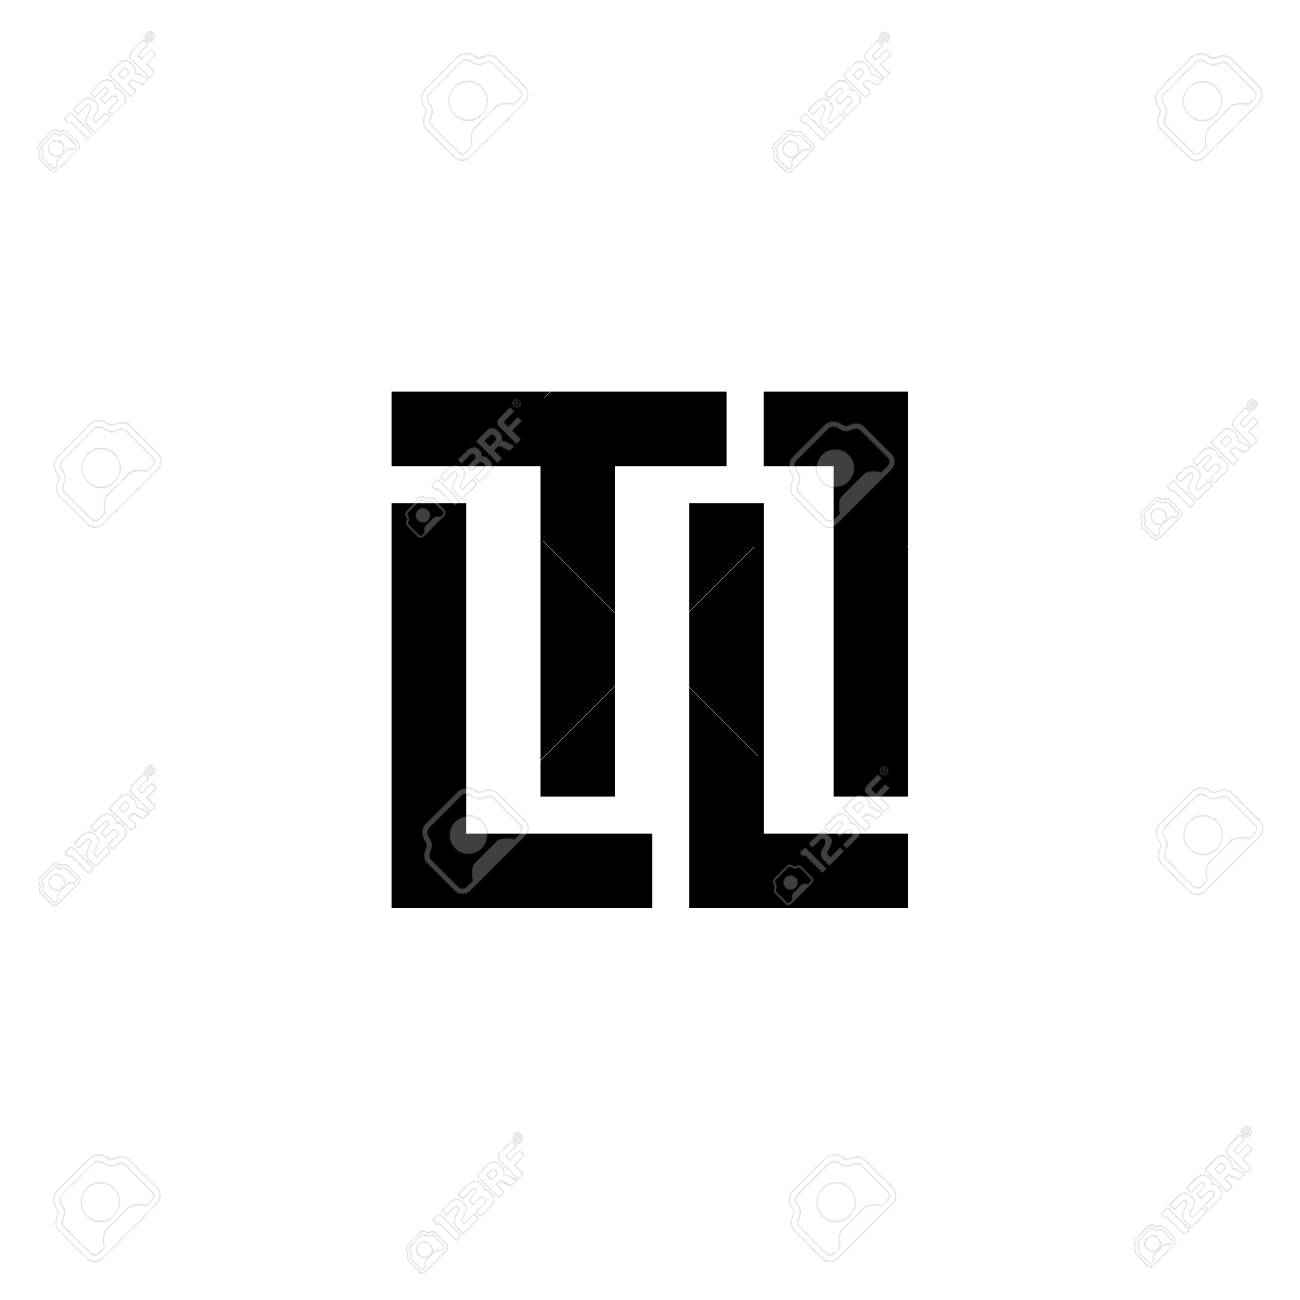 LETTER LOGO TL - 123154311